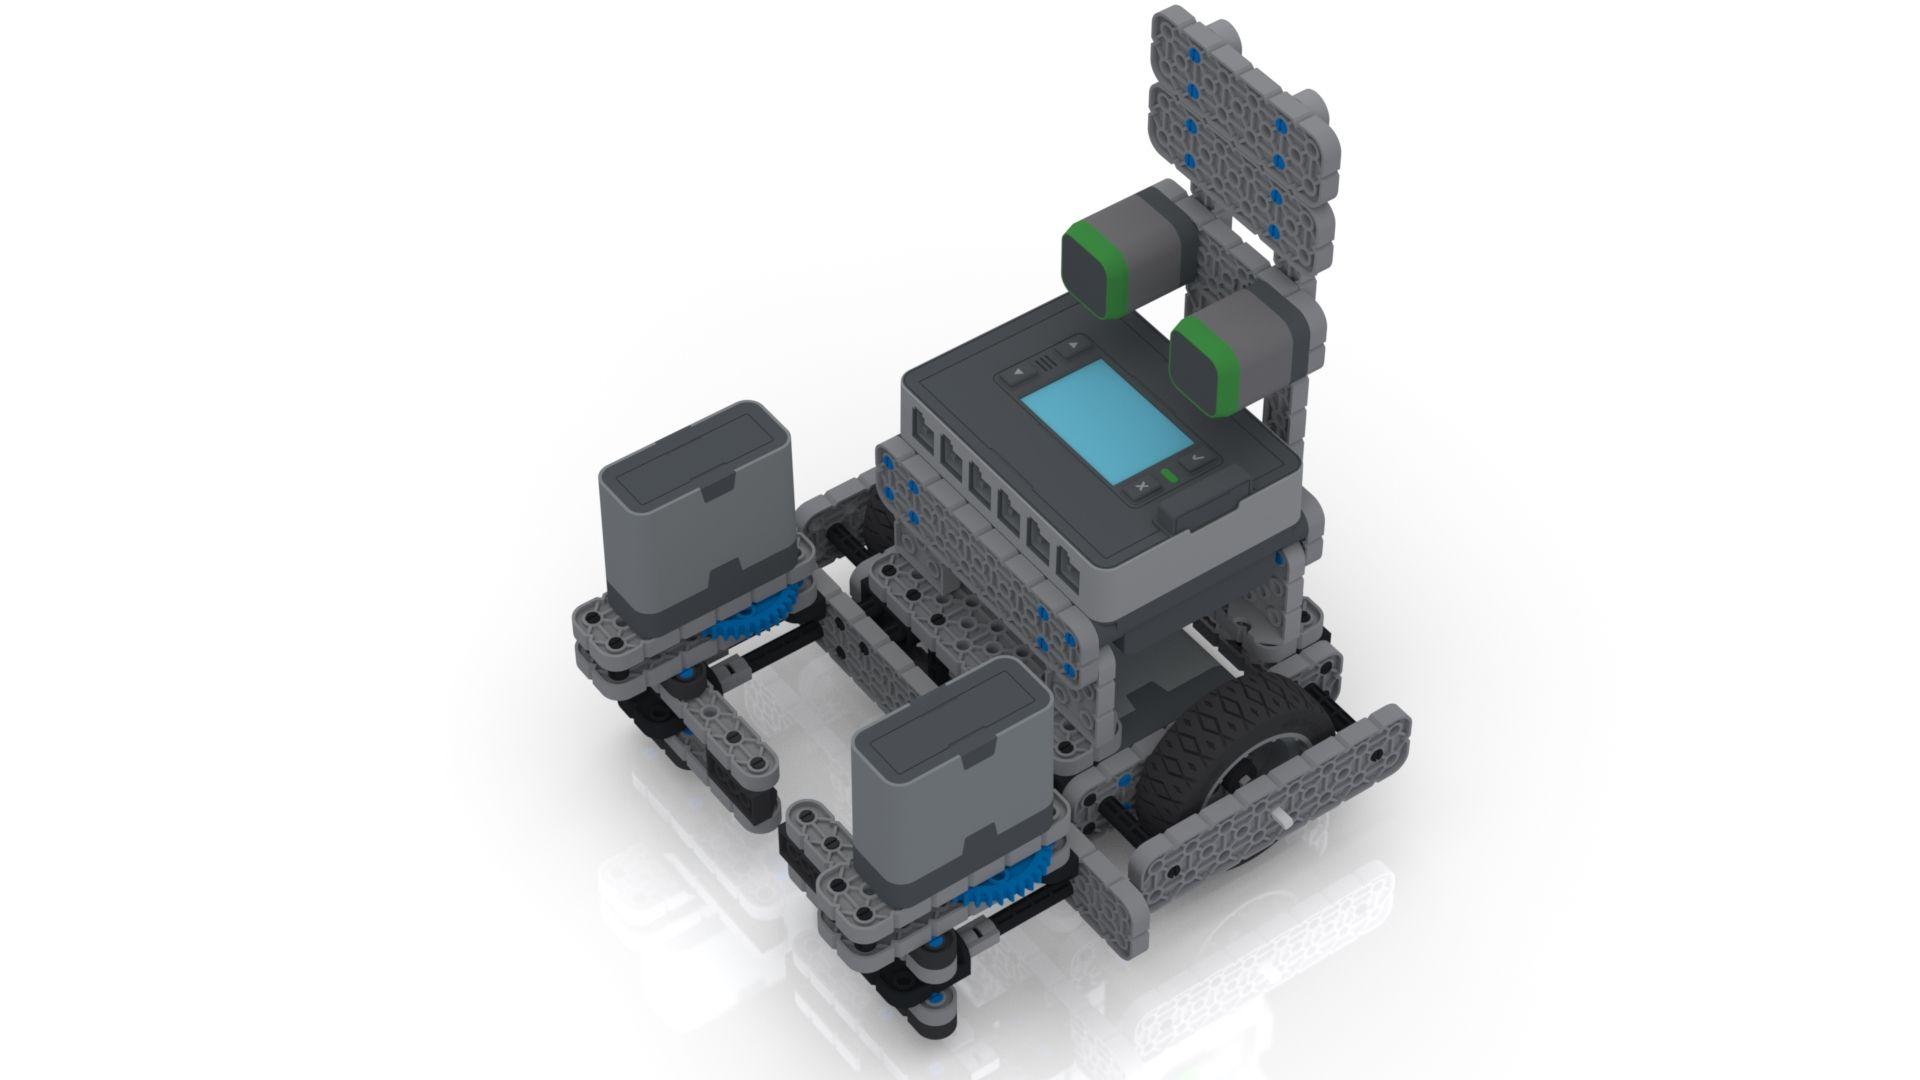 Fabrica-de-nerdes-vex-iq-lucas13-3500-3500